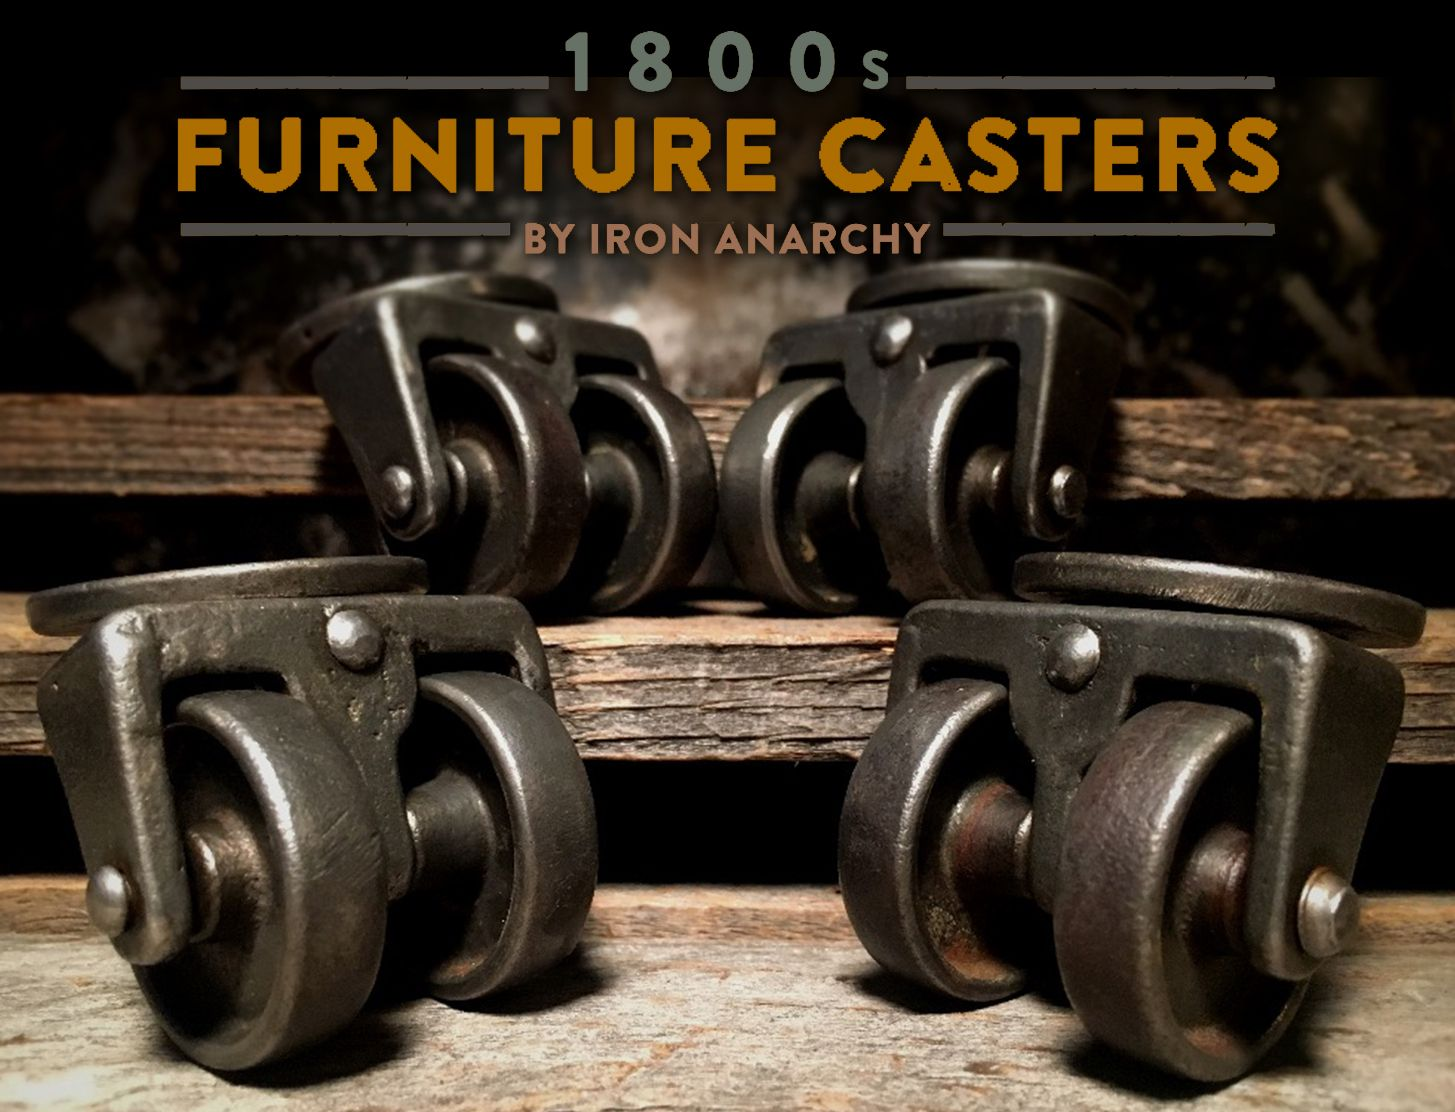 Superb Antique Furniture Casters In 2019 Antique Casters Download Free Architecture Designs Embacsunscenecom